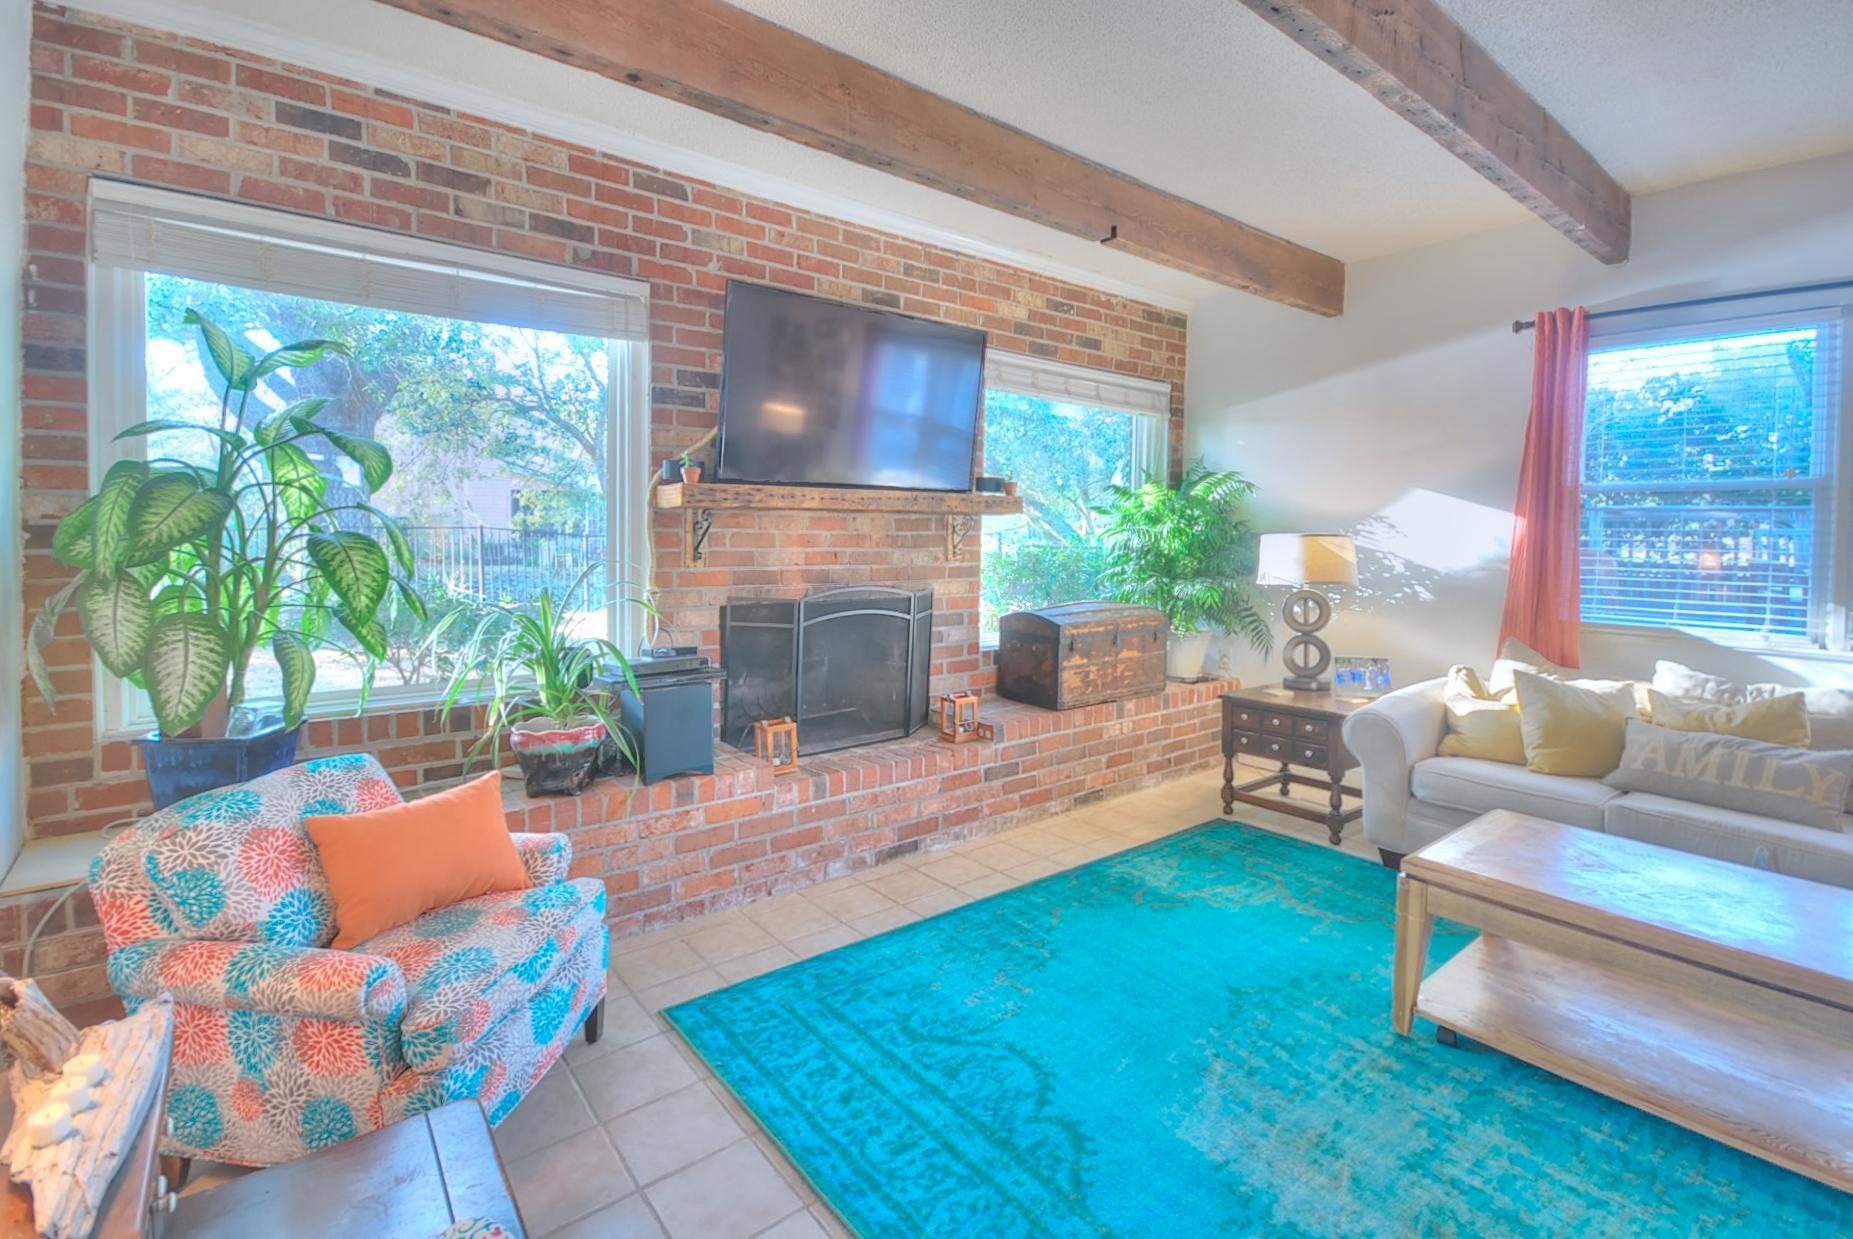 Capri Isles Homes For Sale - 213 Wappoo, Charleston, SC - 29